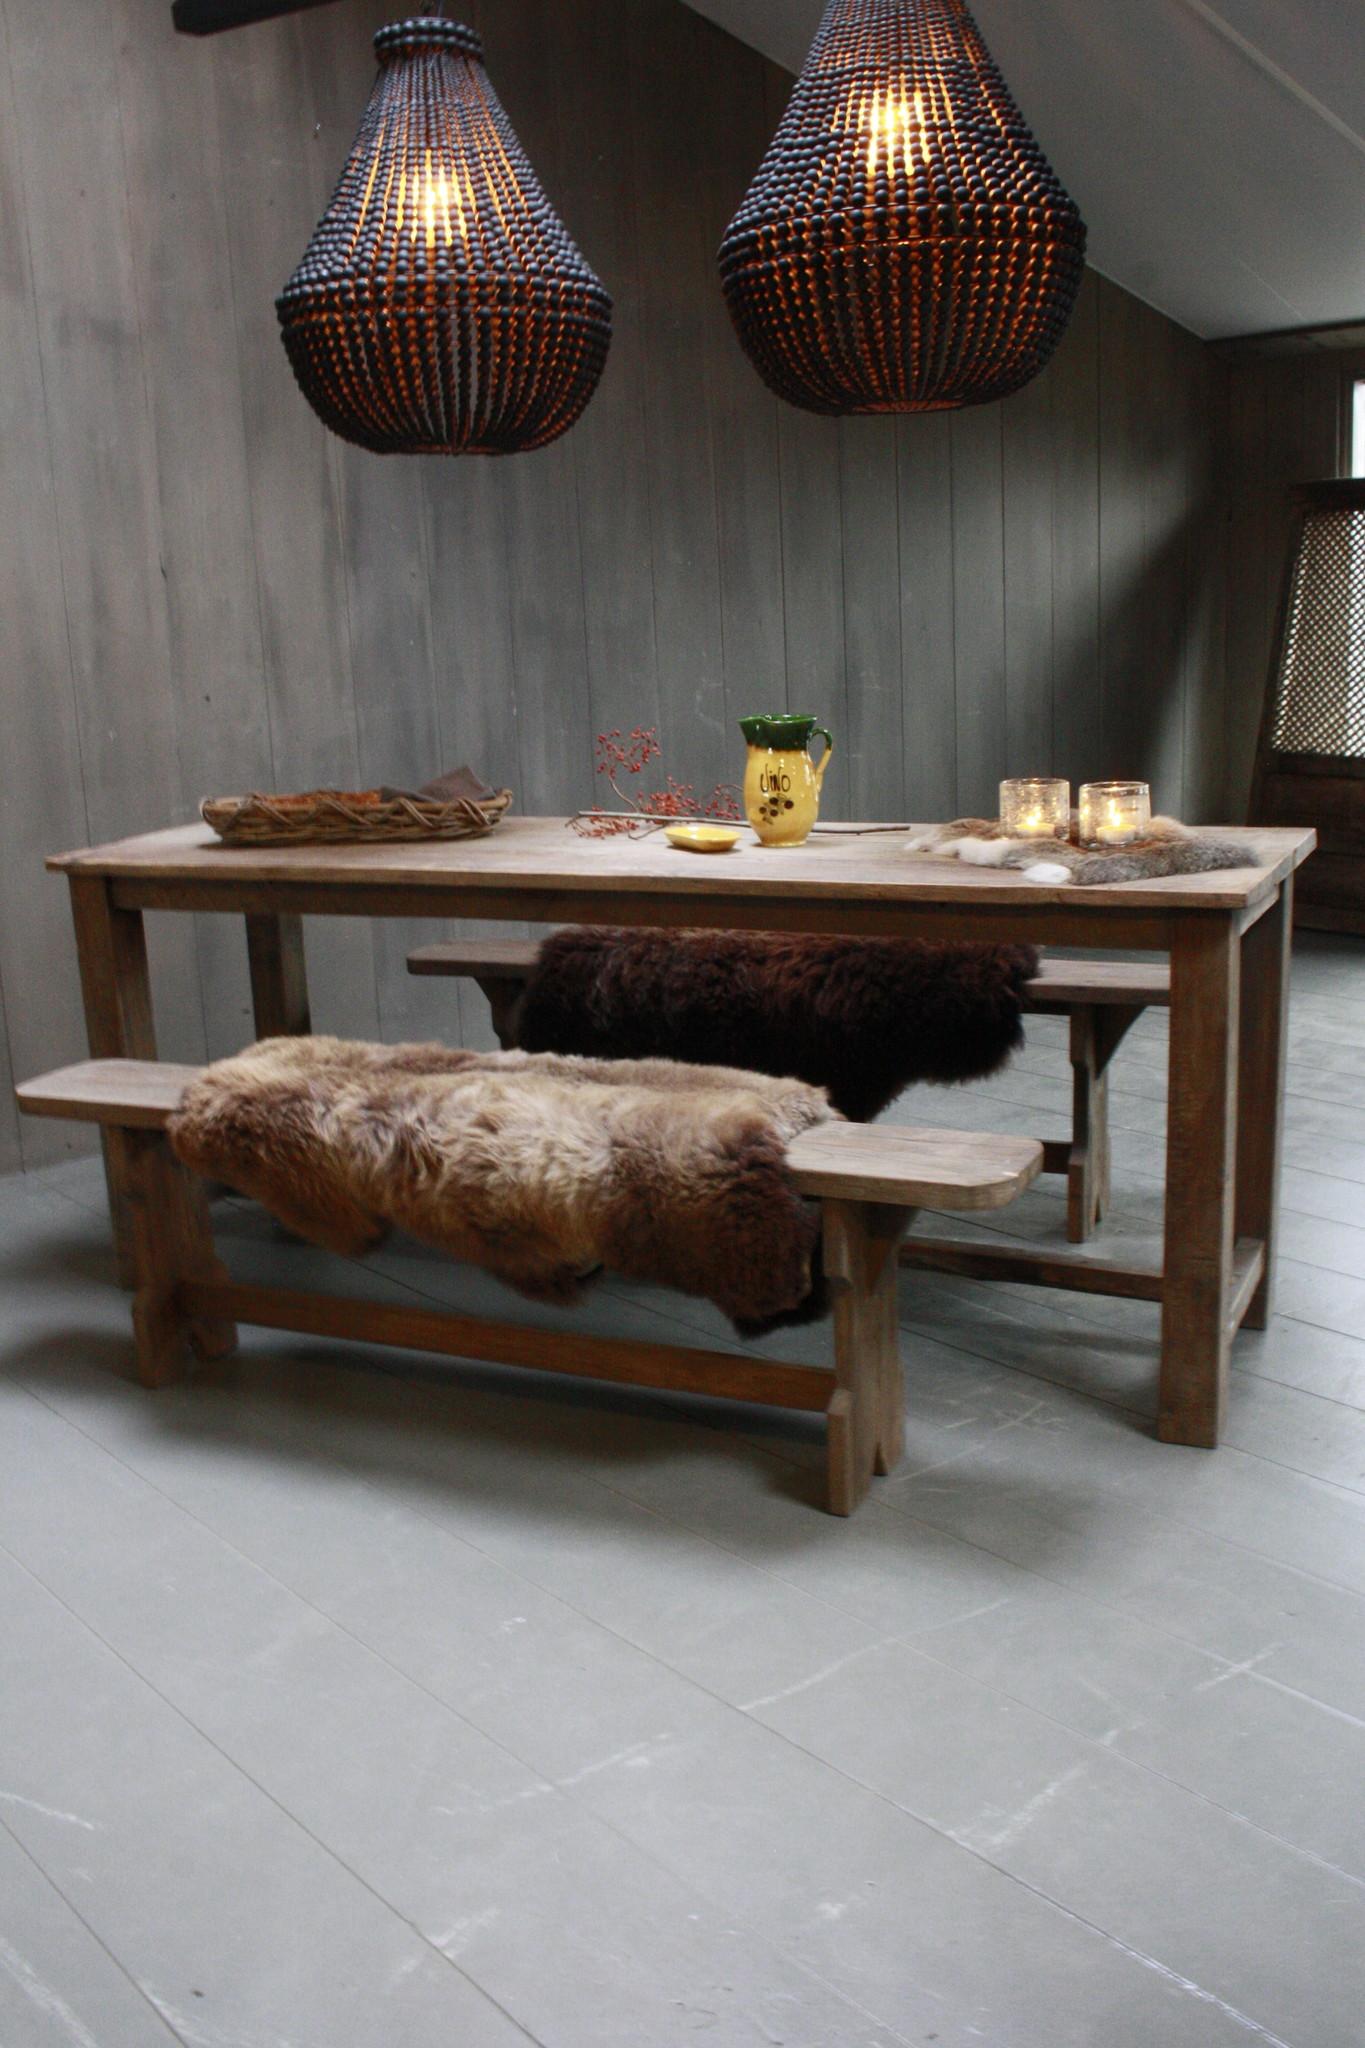 Oud houten eetkamer set met 2 houten bankjes-2